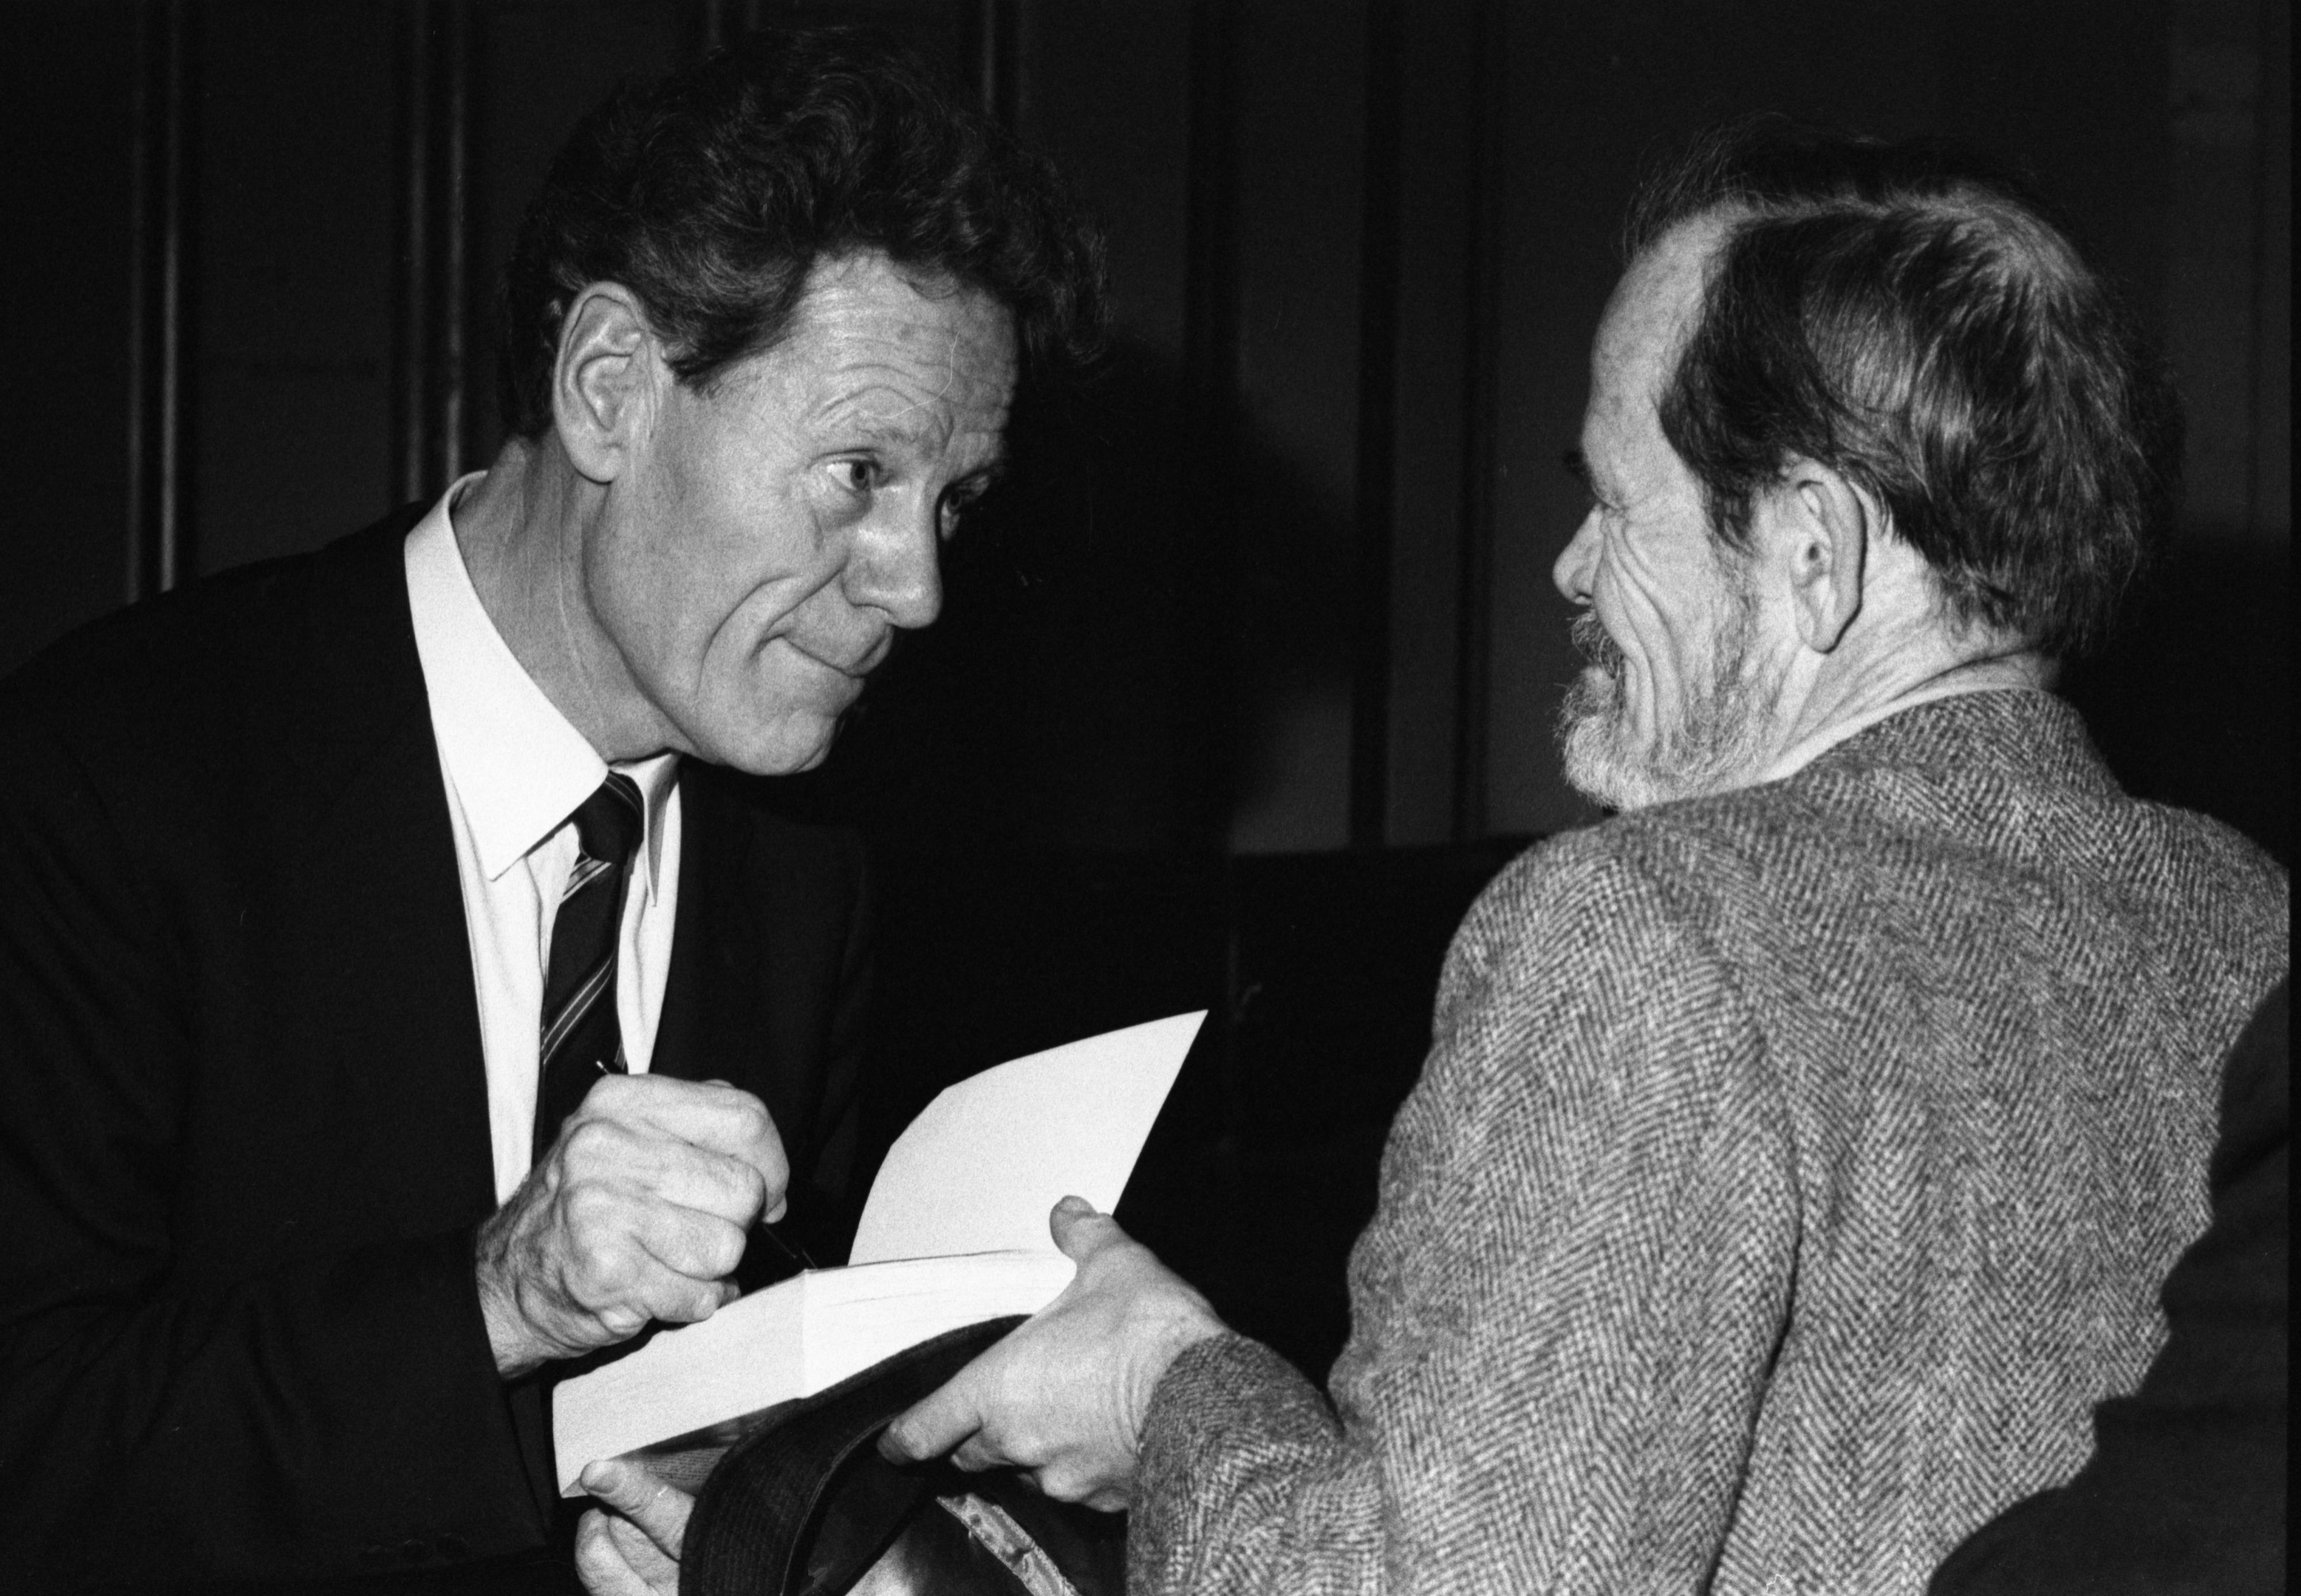 Hans Kung Autographs Book For Fan After Rackham Lecture, November 22, 1983